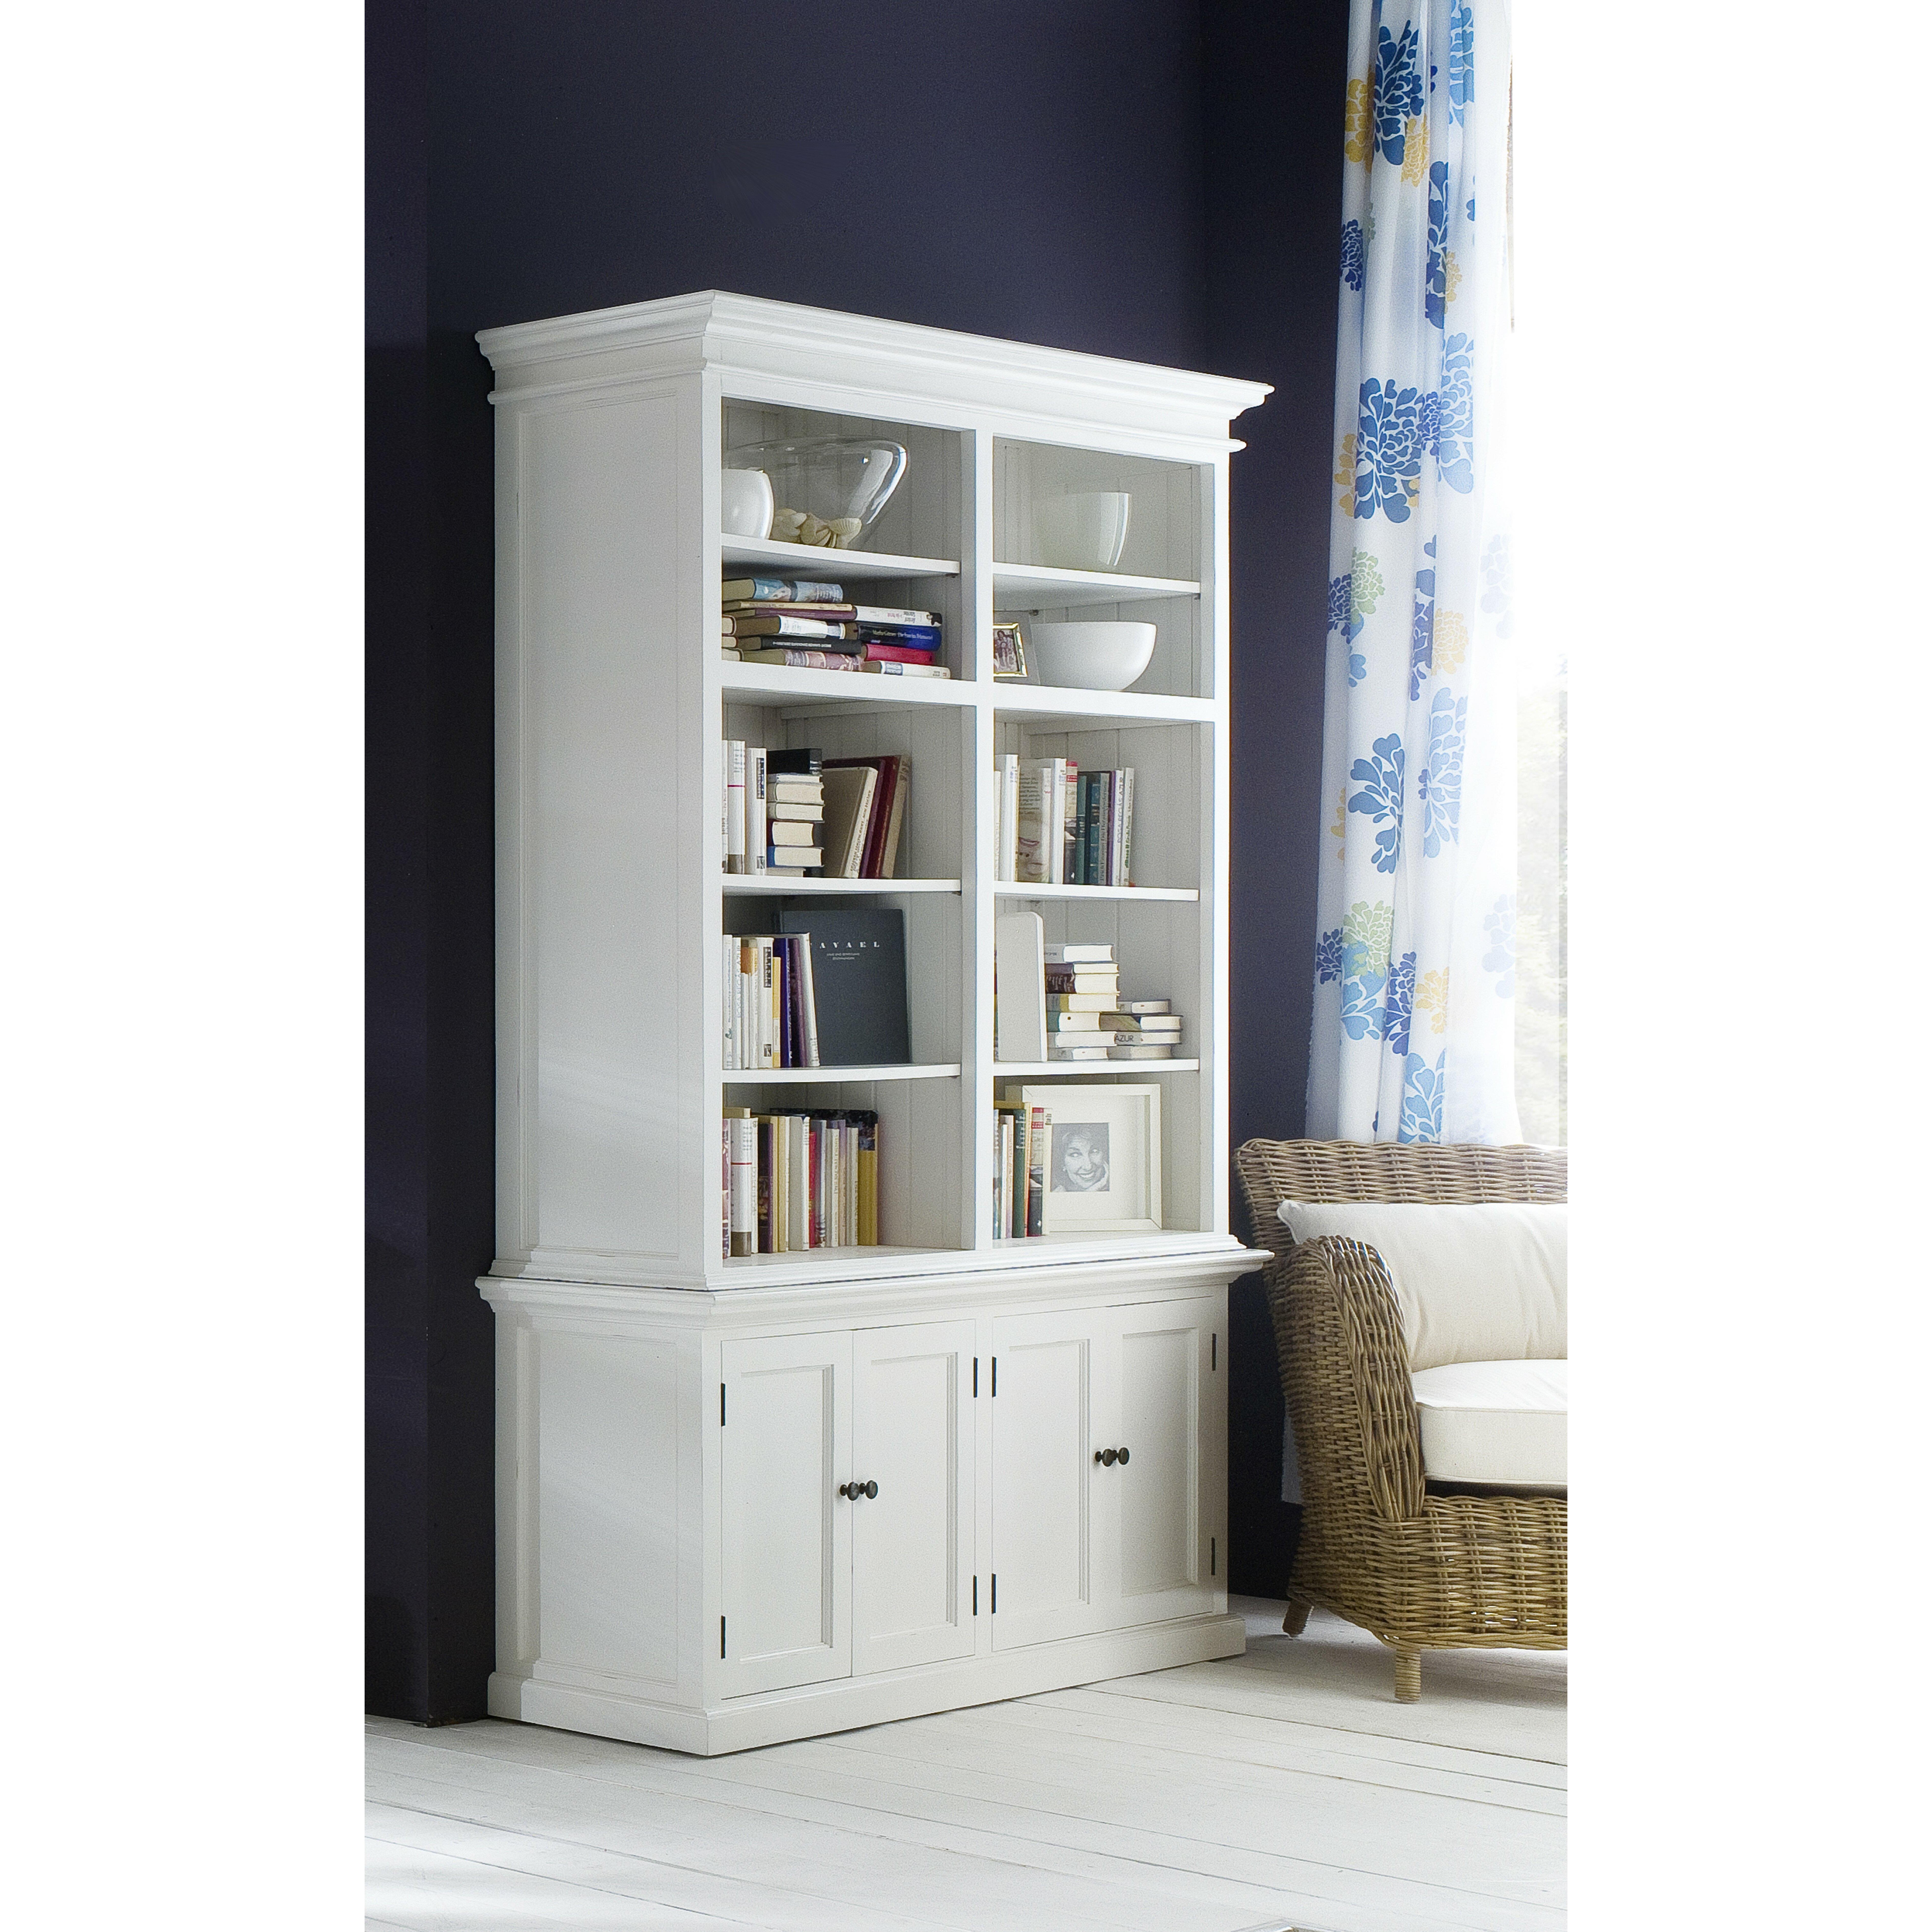 burlington 87 bookcase reviews joss main. Black Bedroom Furniture Sets. Home Design Ideas